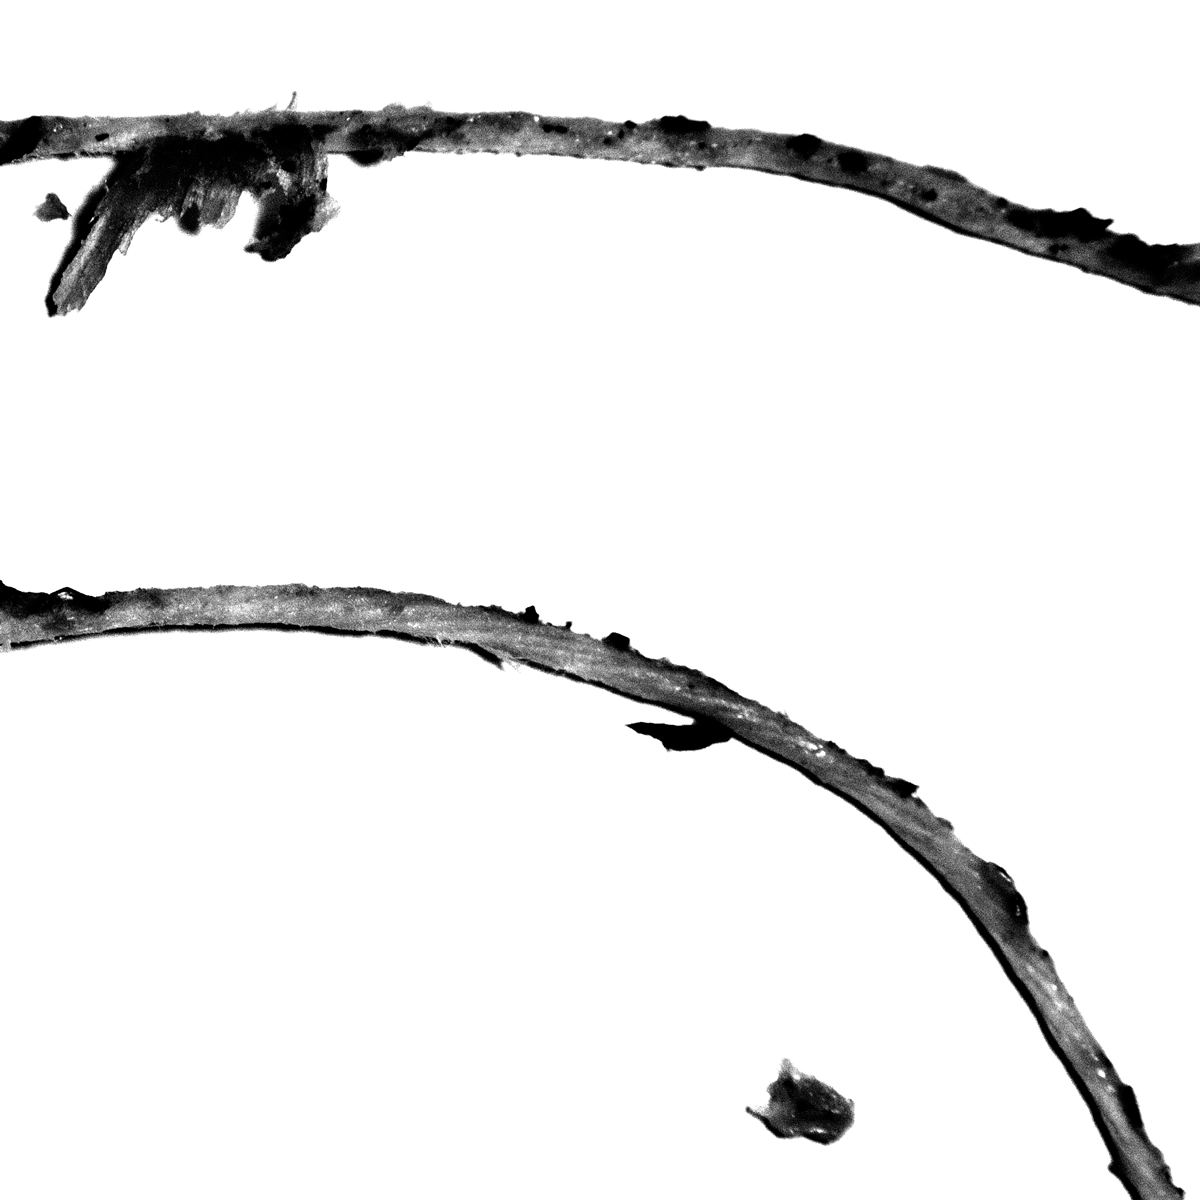 Untitled (strings #2), 2013